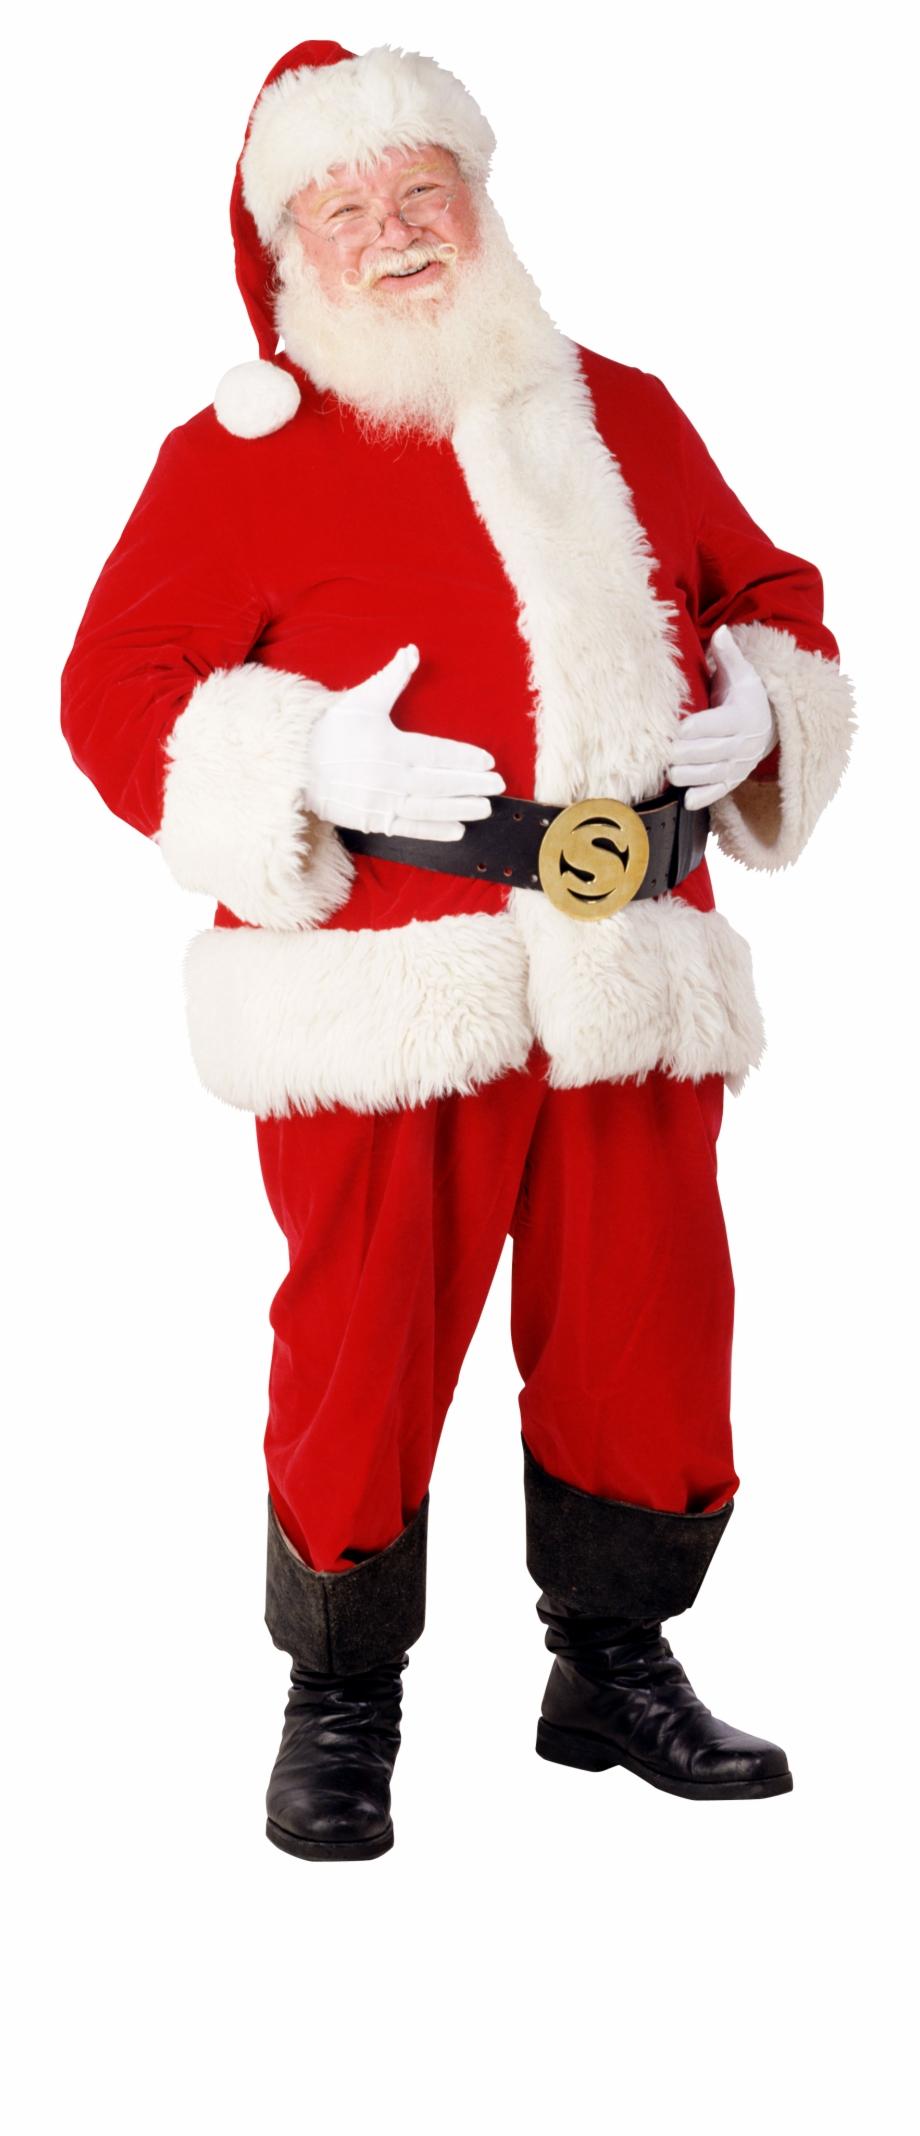 Santa Claus Png Image.